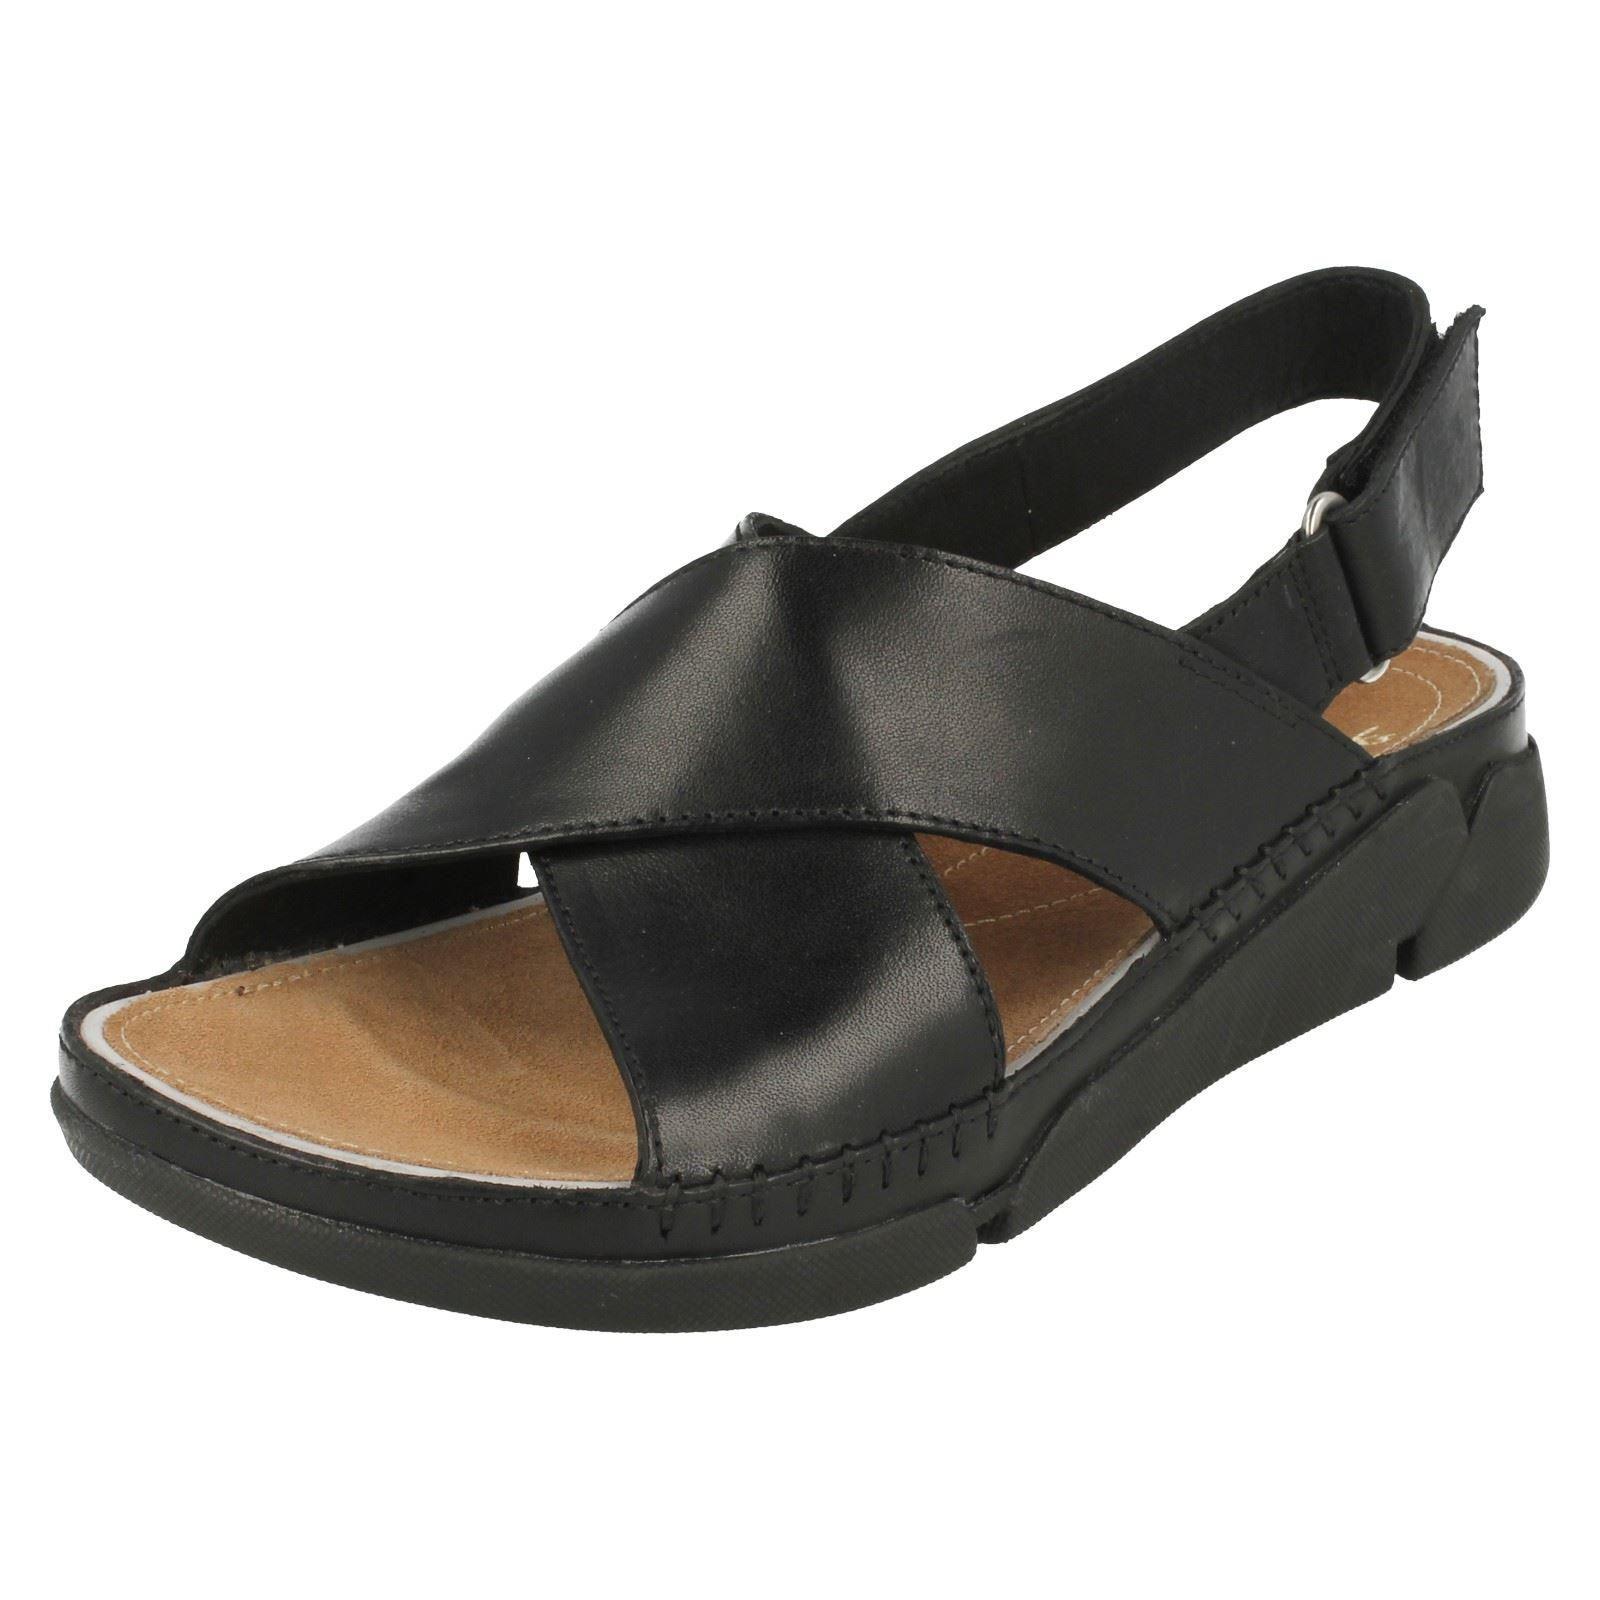 Ladies Clarks Casual Summer Sandals Tri Alexia Ebay